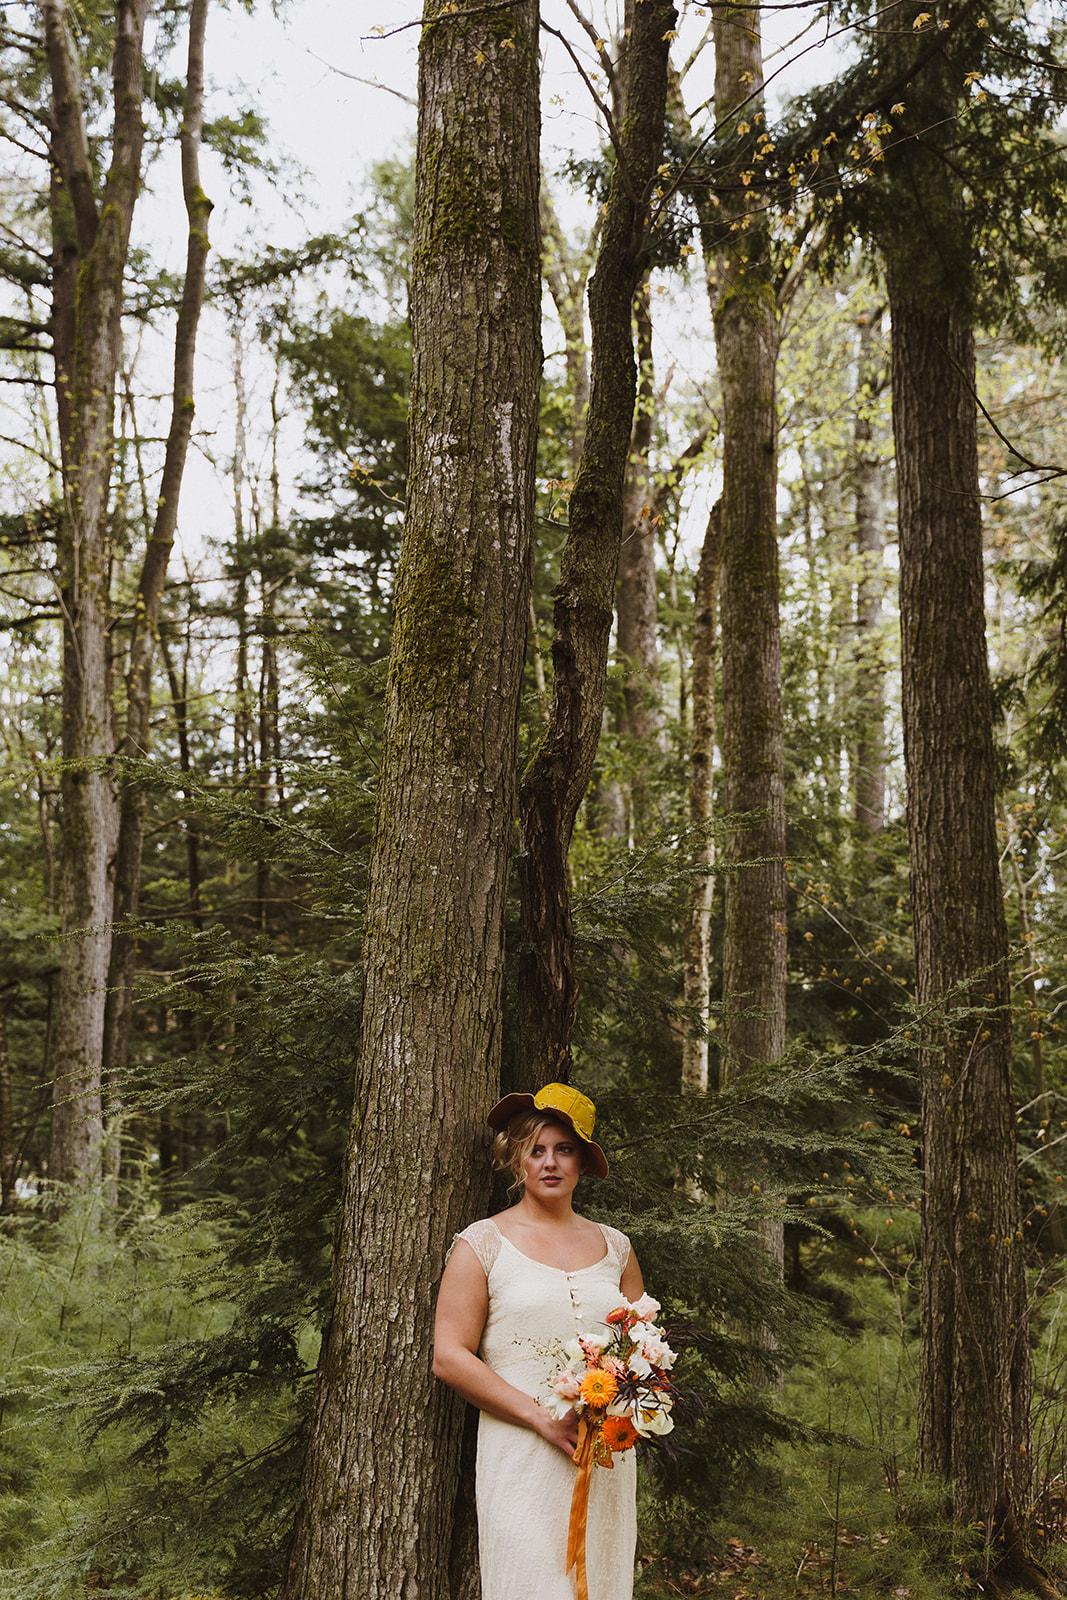 Tuckaway Tree Farm Lebanon Maine Wedding Inspiration 71